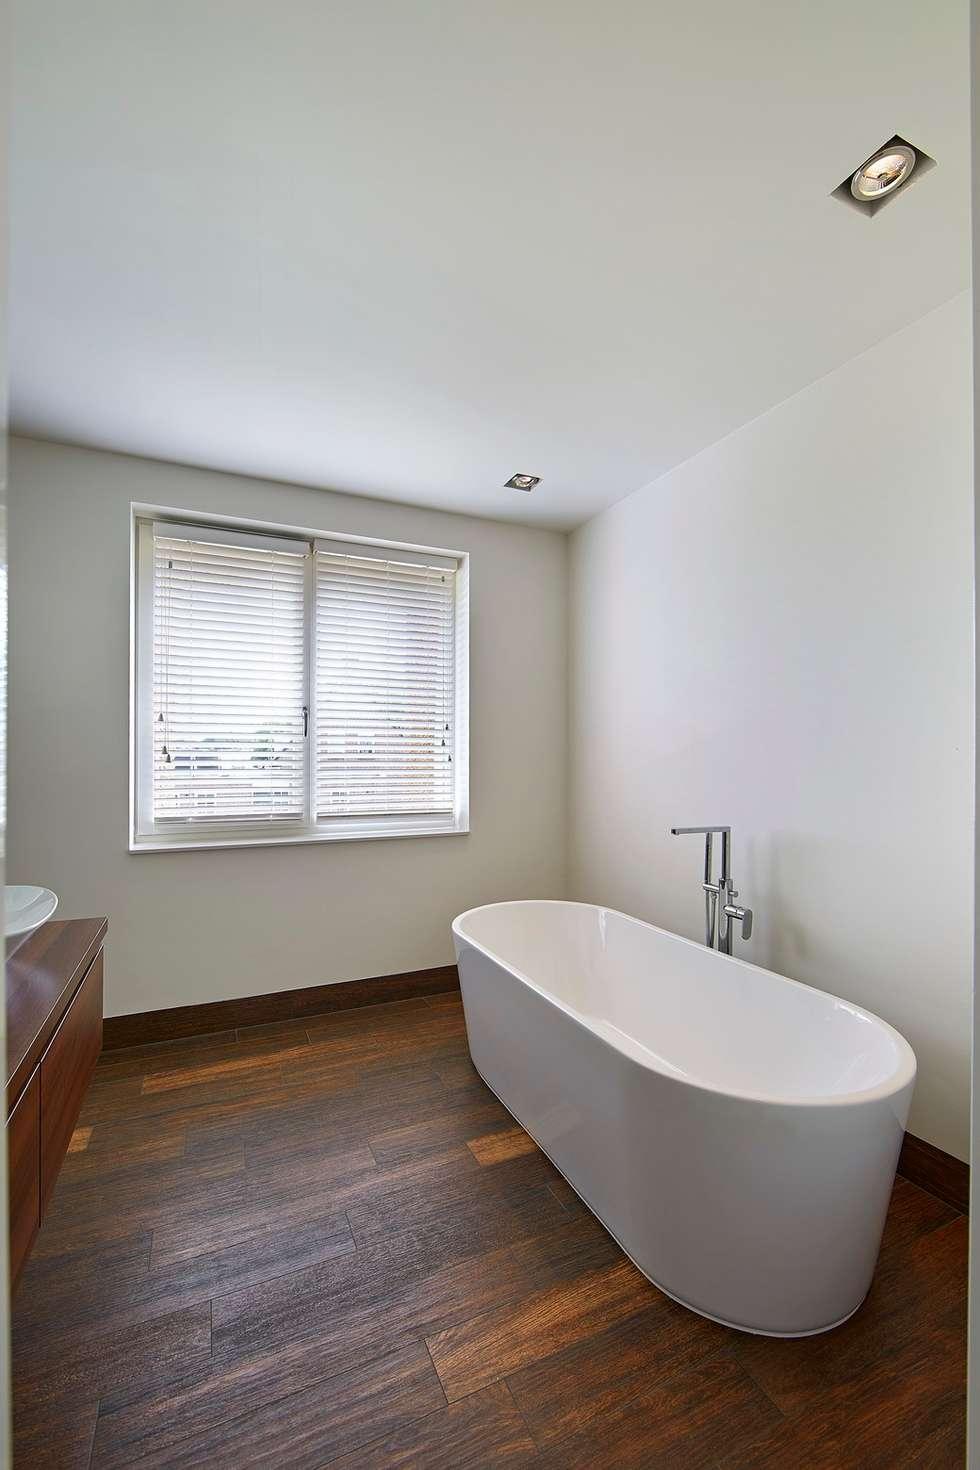 https://images.homify.com/c_fill,f_auto,q_auto:eco,w_980/v1503040887/p/photo/image/2184555/z-Interieur-jaren_30-woning-Moerkapelle-Architect-Brand_BBA-11.jpg